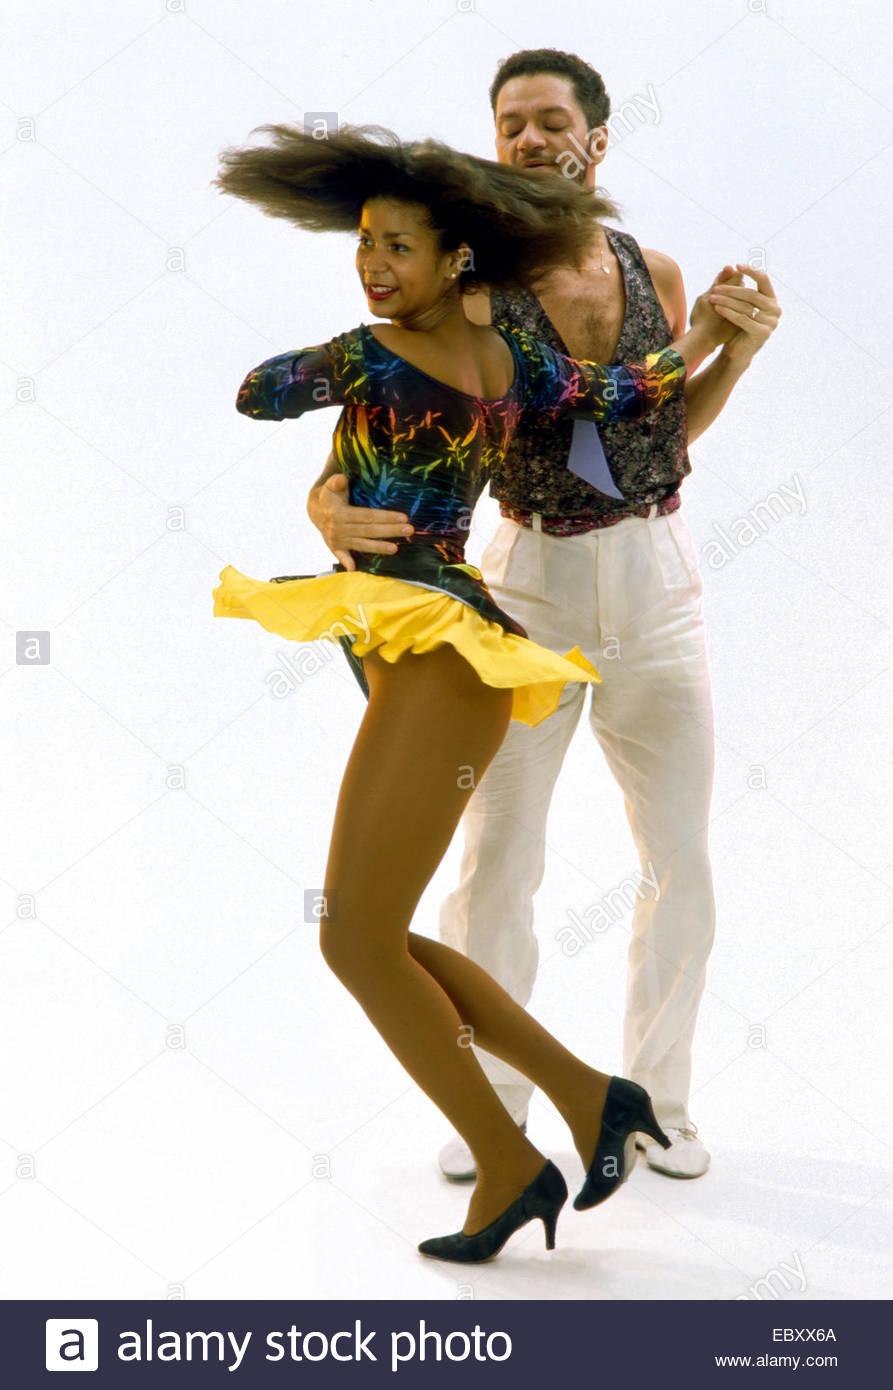 Pareja bailando Lambada